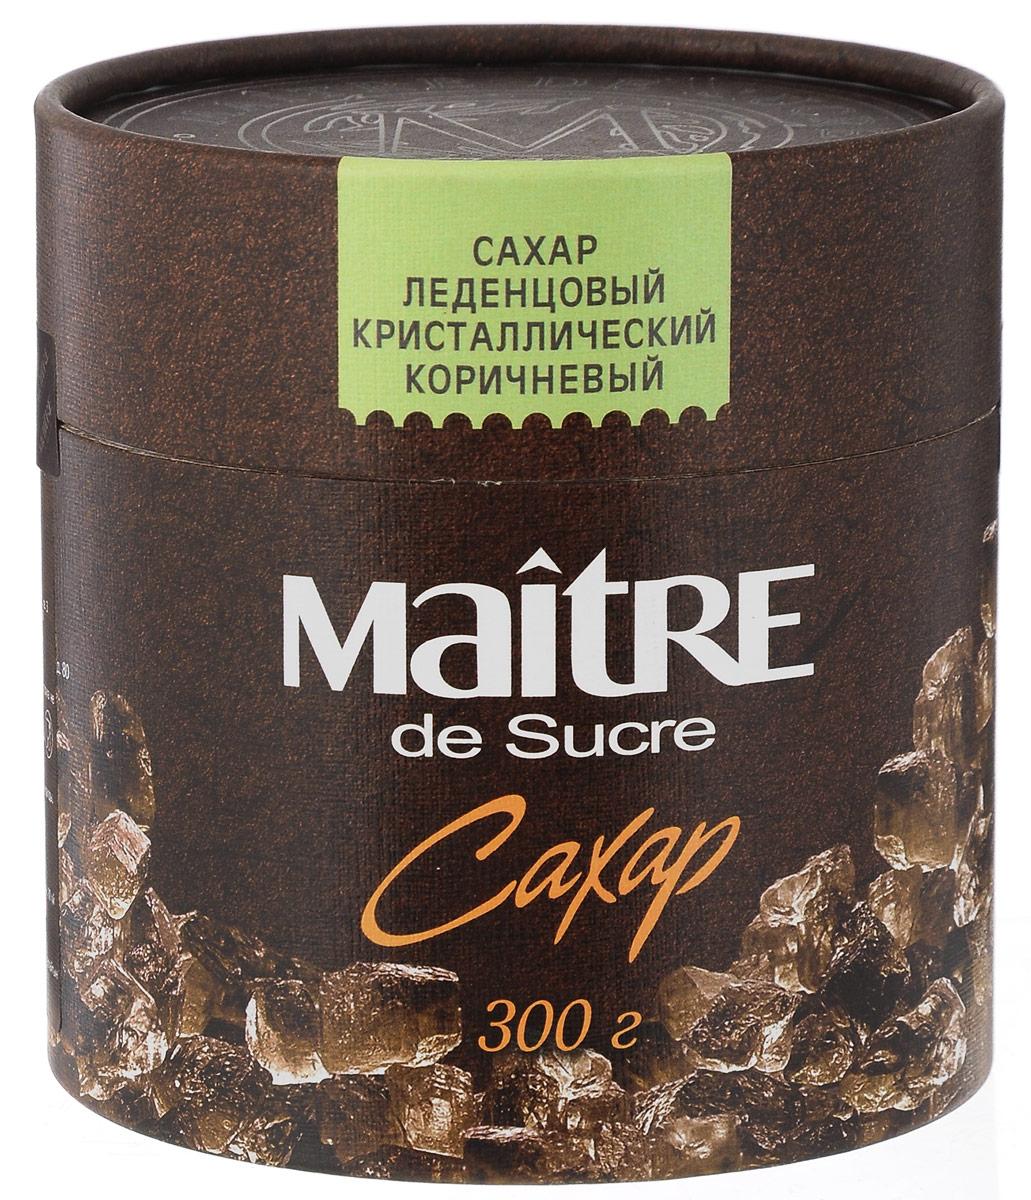 Maitre de Sucre сахар леденцовый коричневый кристаллический, 300 г maitre сахар леденцовый кристаллический прозрачный 800 г